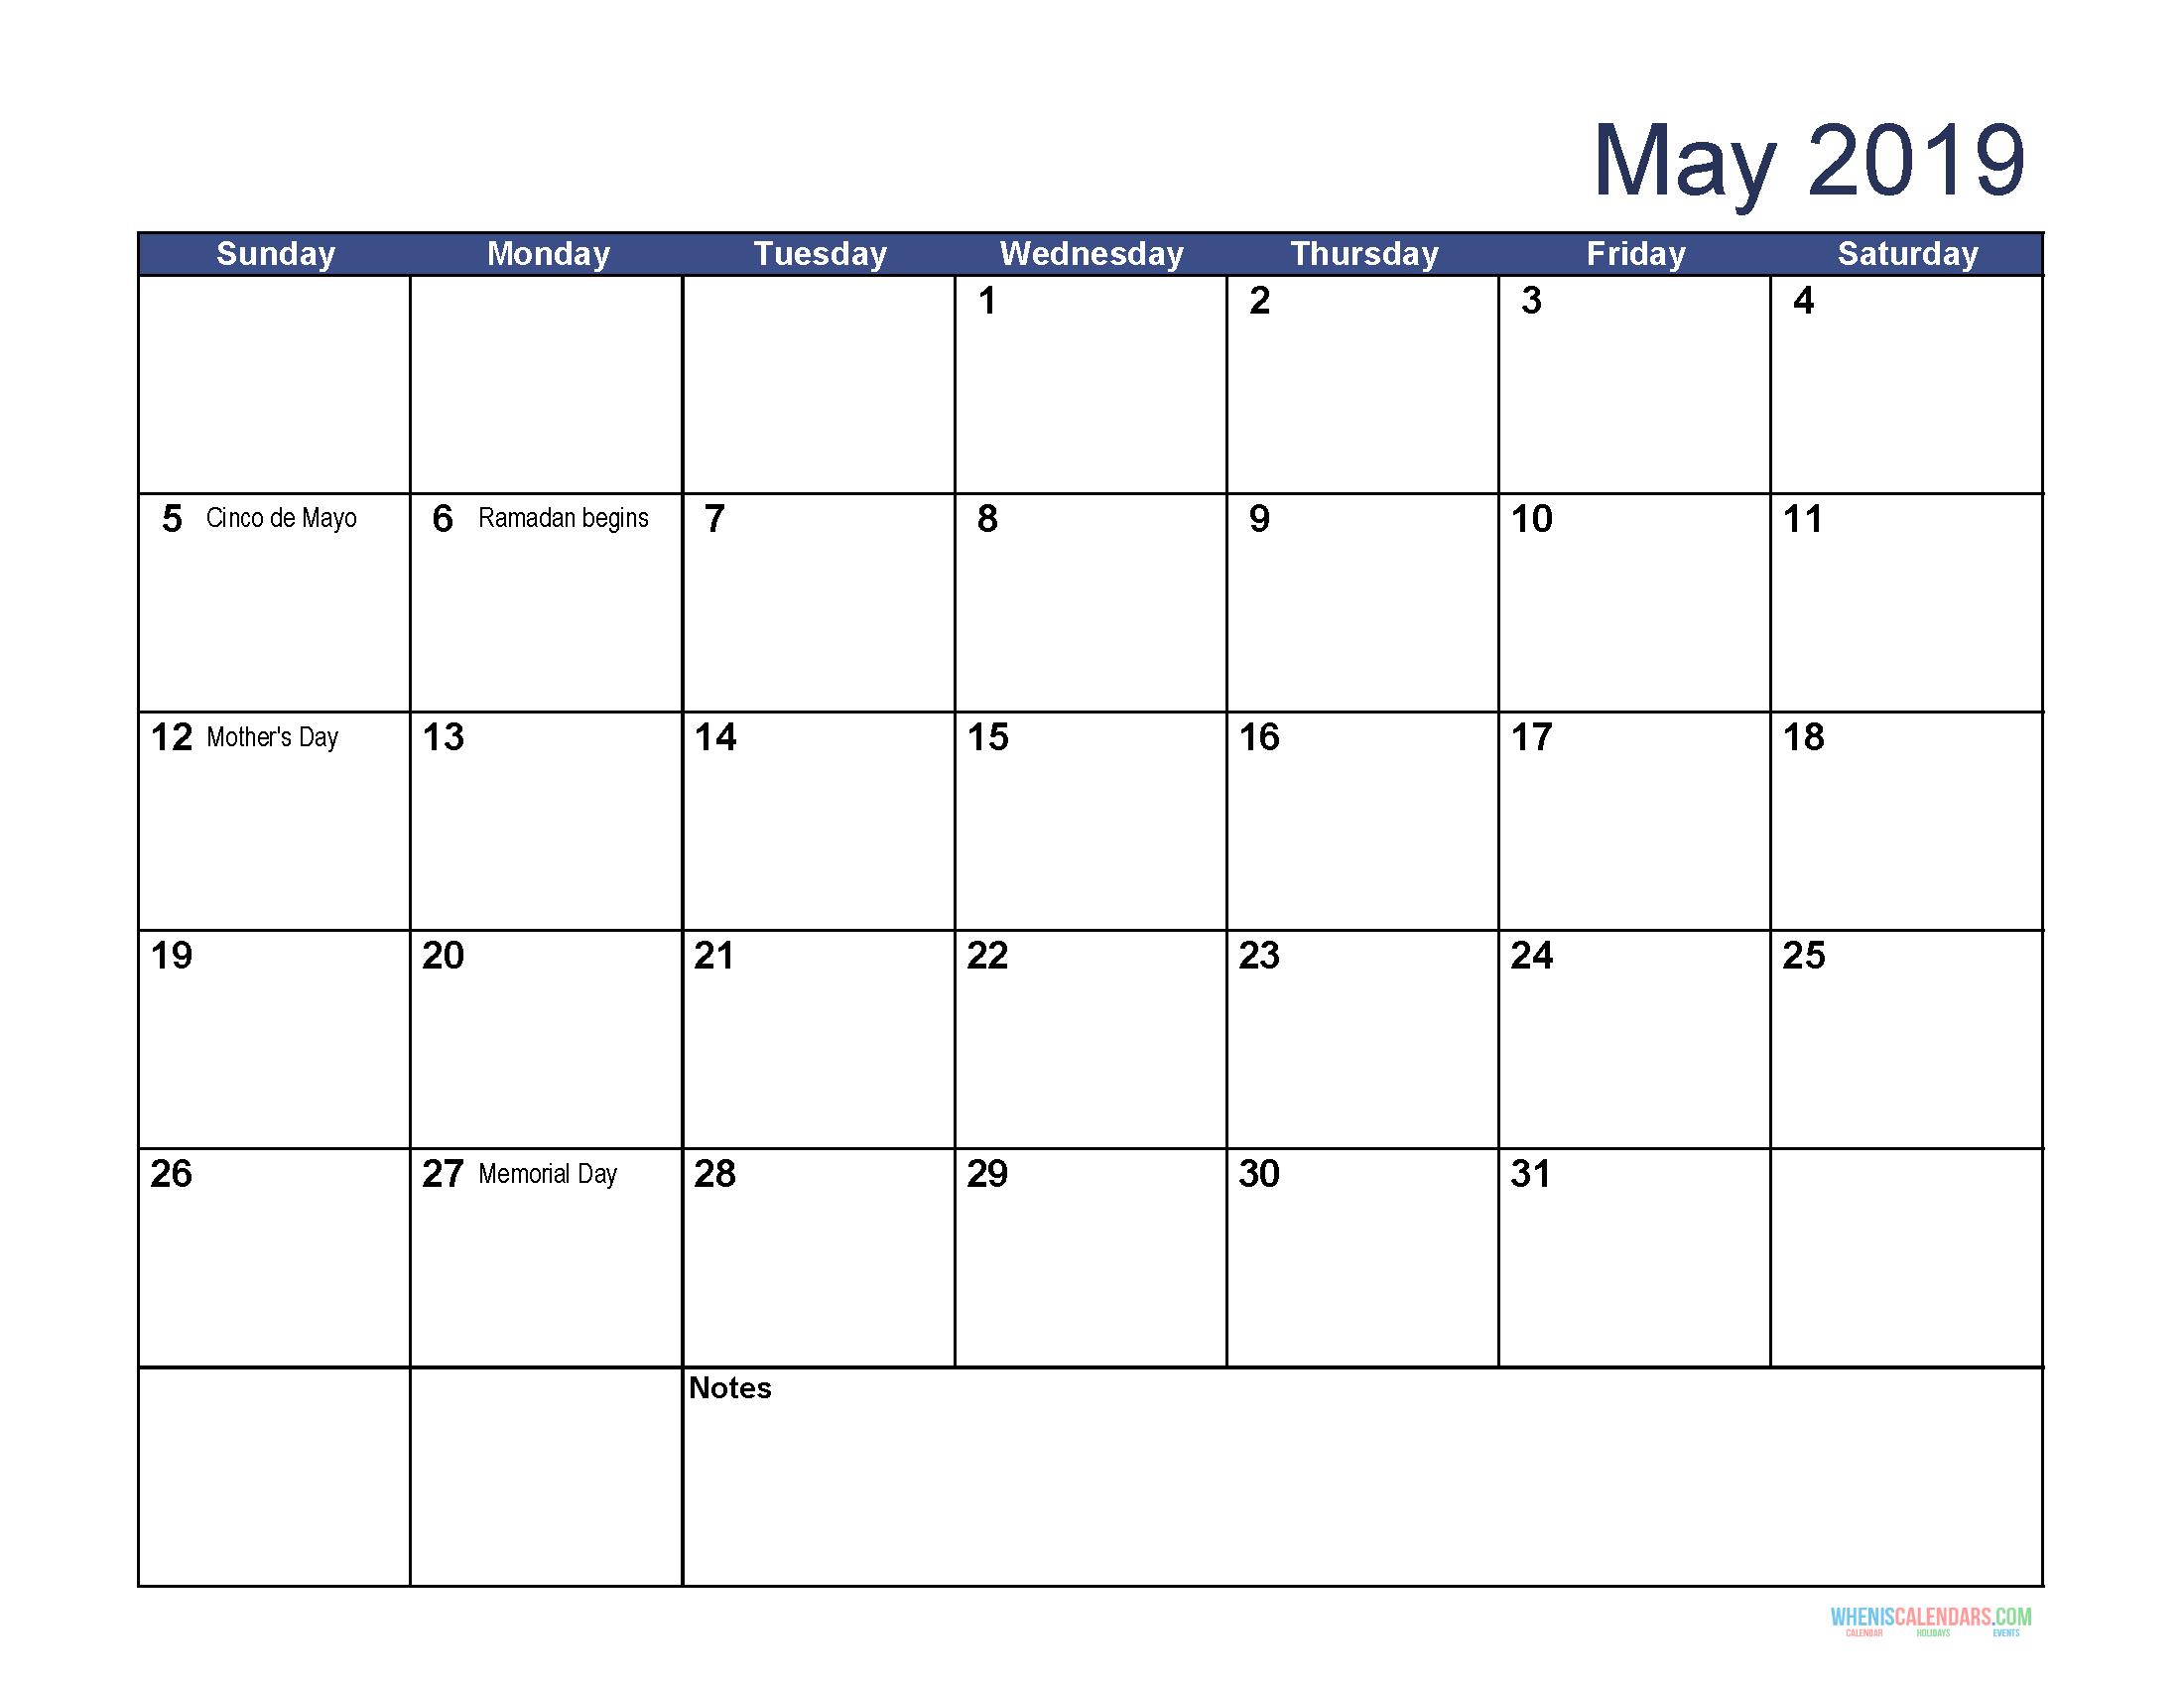 May 2019 Calendar With Holidays Usa, Uk, Canada, India